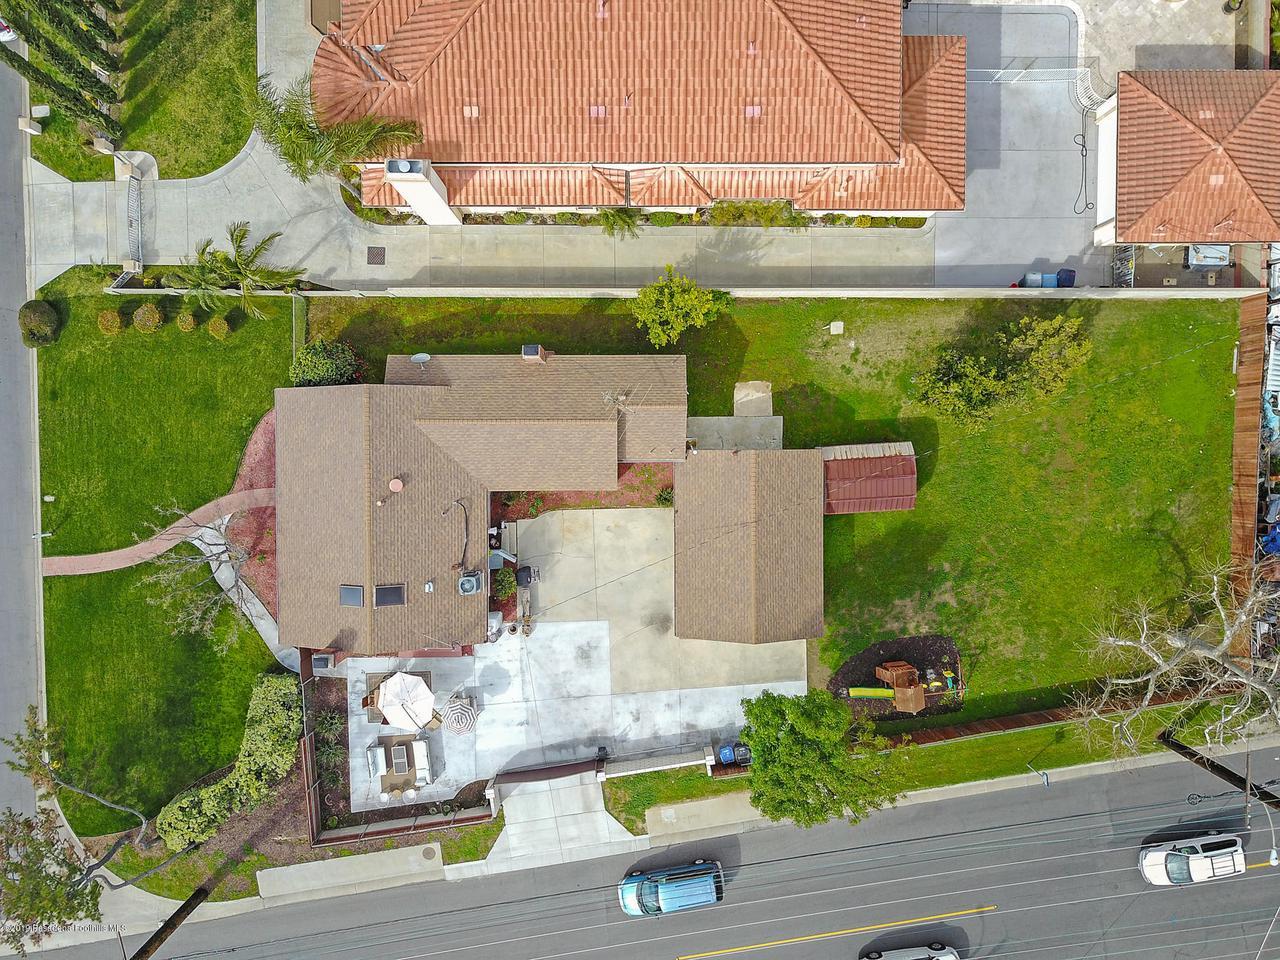 2830 WINTHROP, Arcadia, CA 91007 - 2830 Winthrop Ave (31)